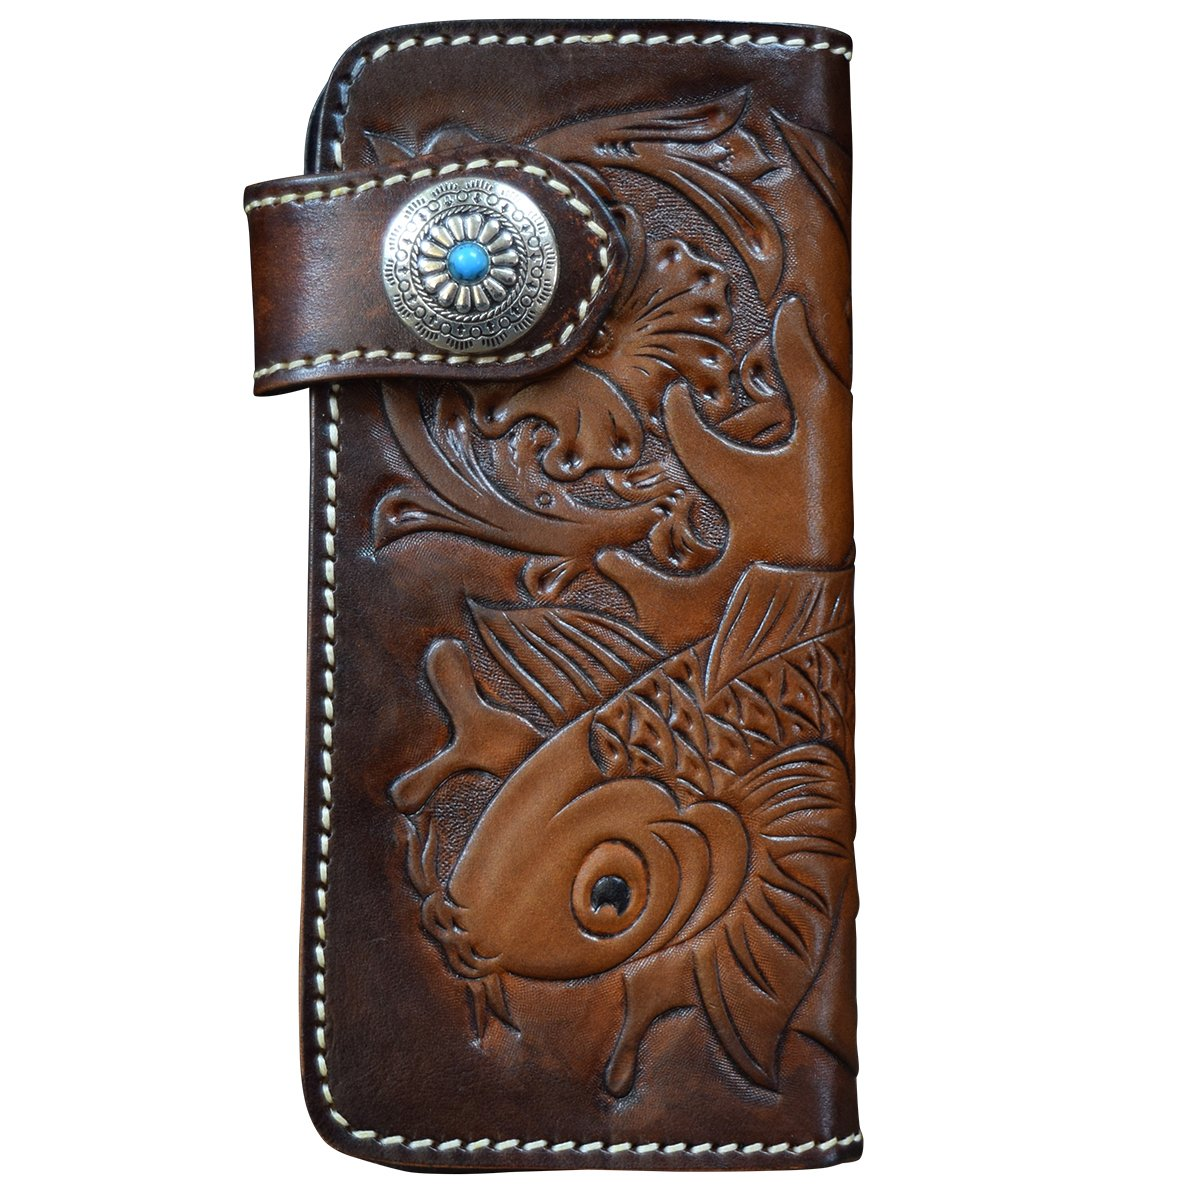 OLG.YAT Vegetable tanned leather Retro Genuine Leather Men's Wallets WL12JL by OLG.YAT